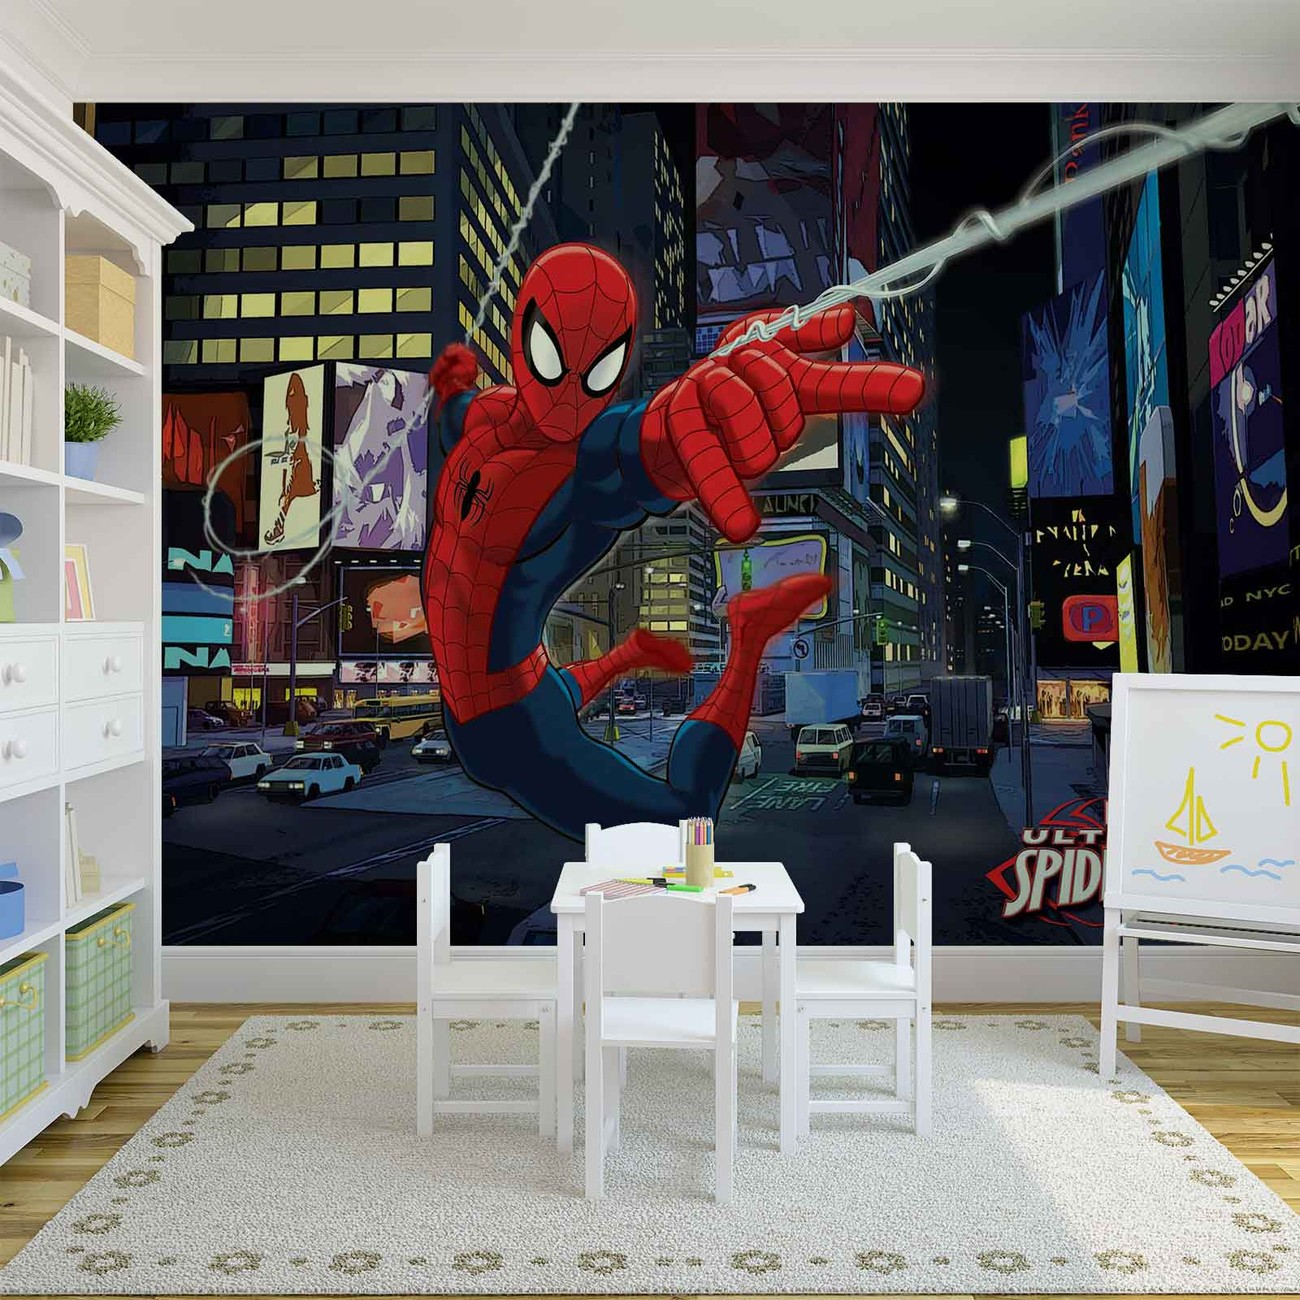 Fotomurale Spiderman Marvel, Papel pintado | Europosters.es